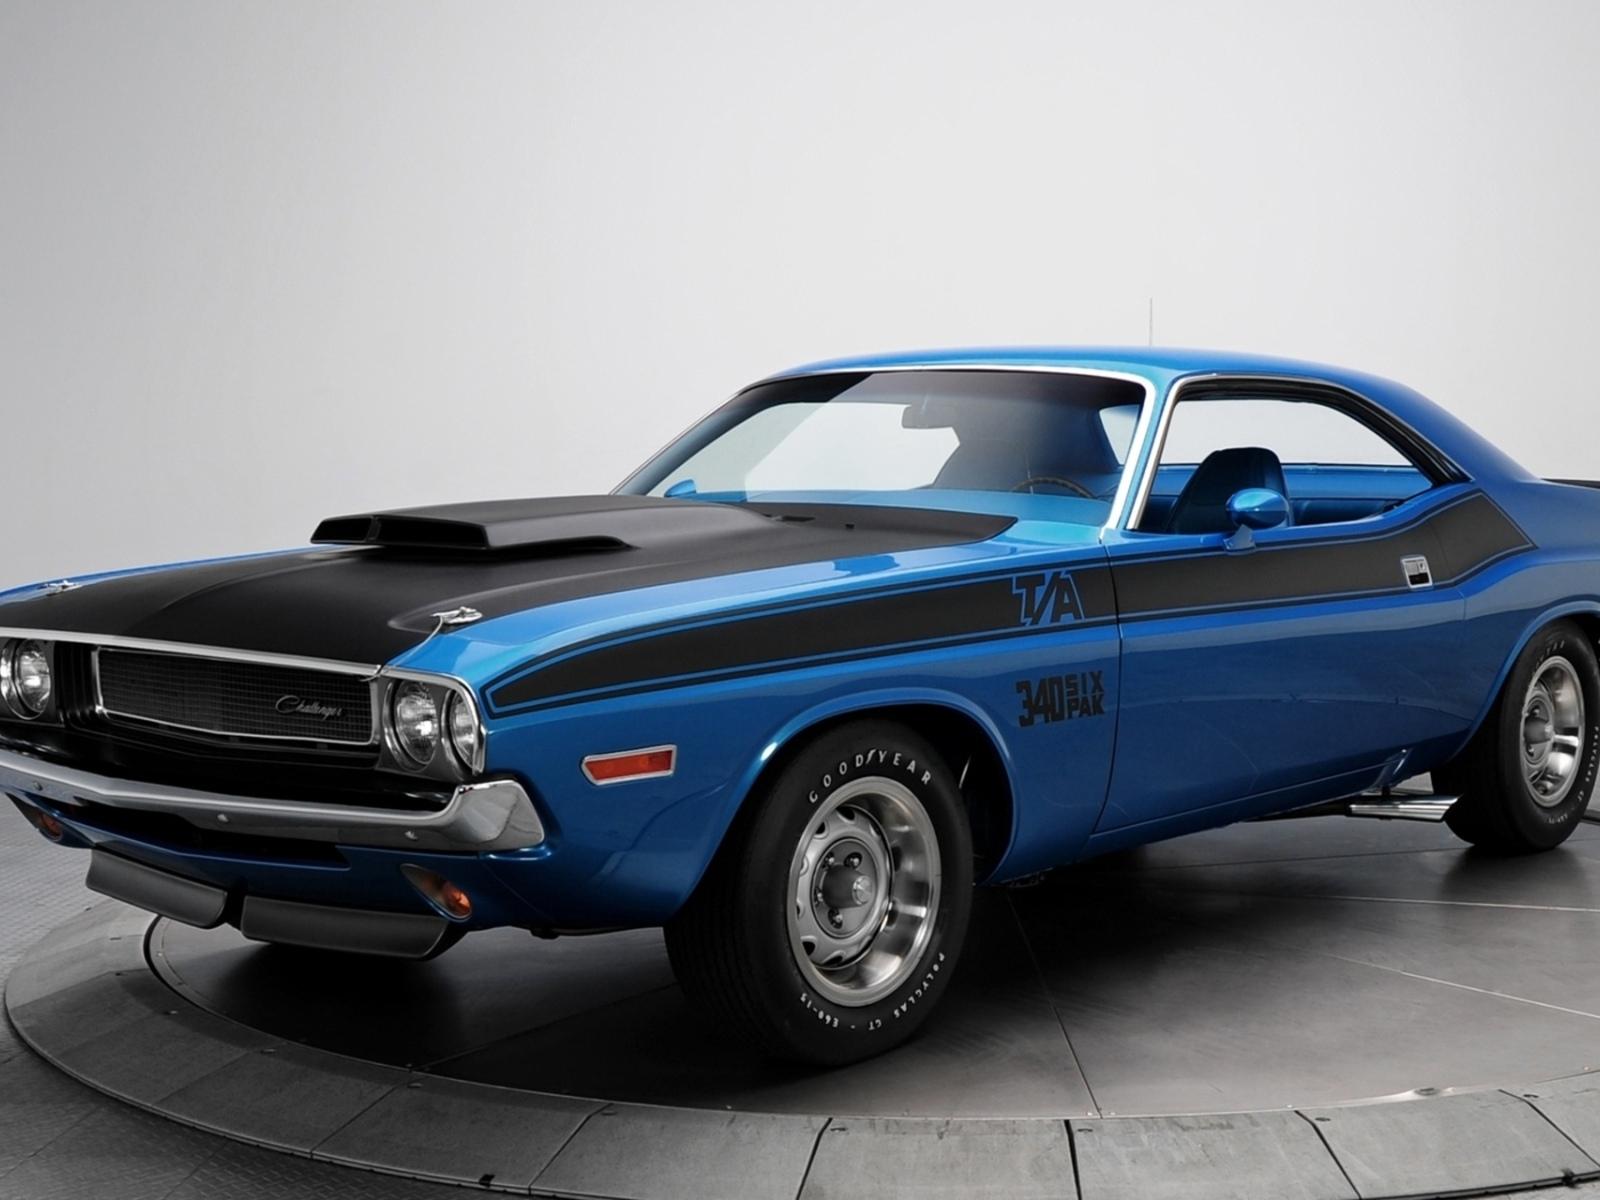 Картинка Додж, синий, фон, Челенжер, Dodge ...: look.com.ua/download/11592/1600x1200